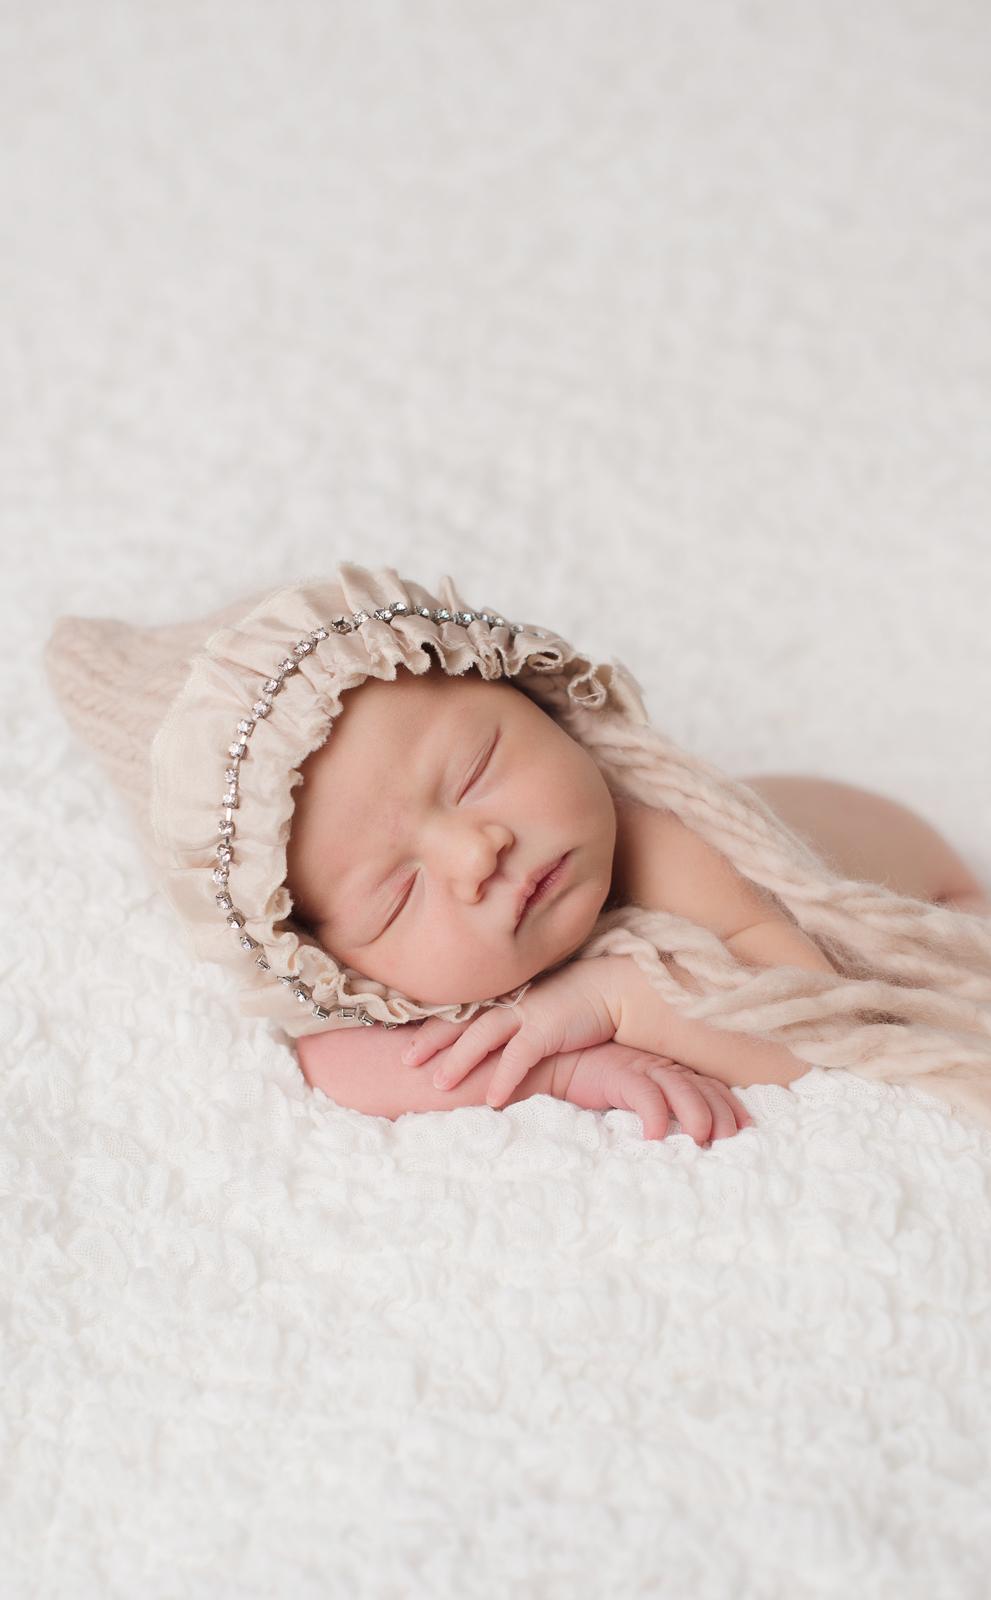 Baby-Photographer-Newborn-Photography-Bozeman-Billings-Montana-Tina-Stinson-Photography-2330.jpg